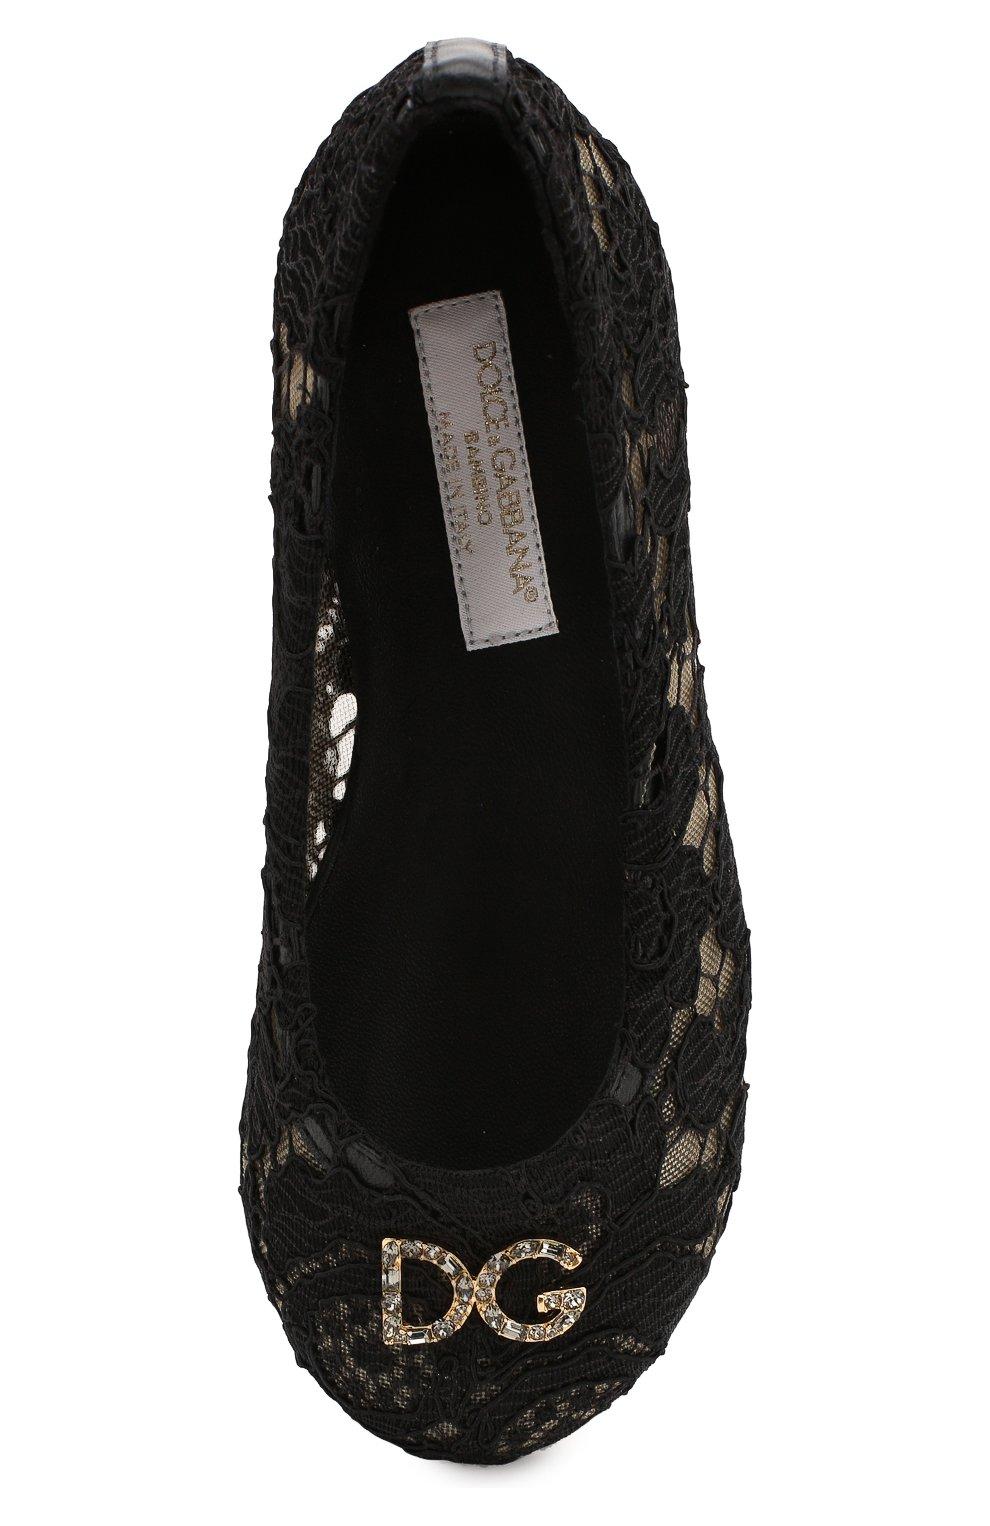 Детские балетки DOLCE & GABBANA черного цвета, арт. D10430/AJ652/24-28 | Фото 4